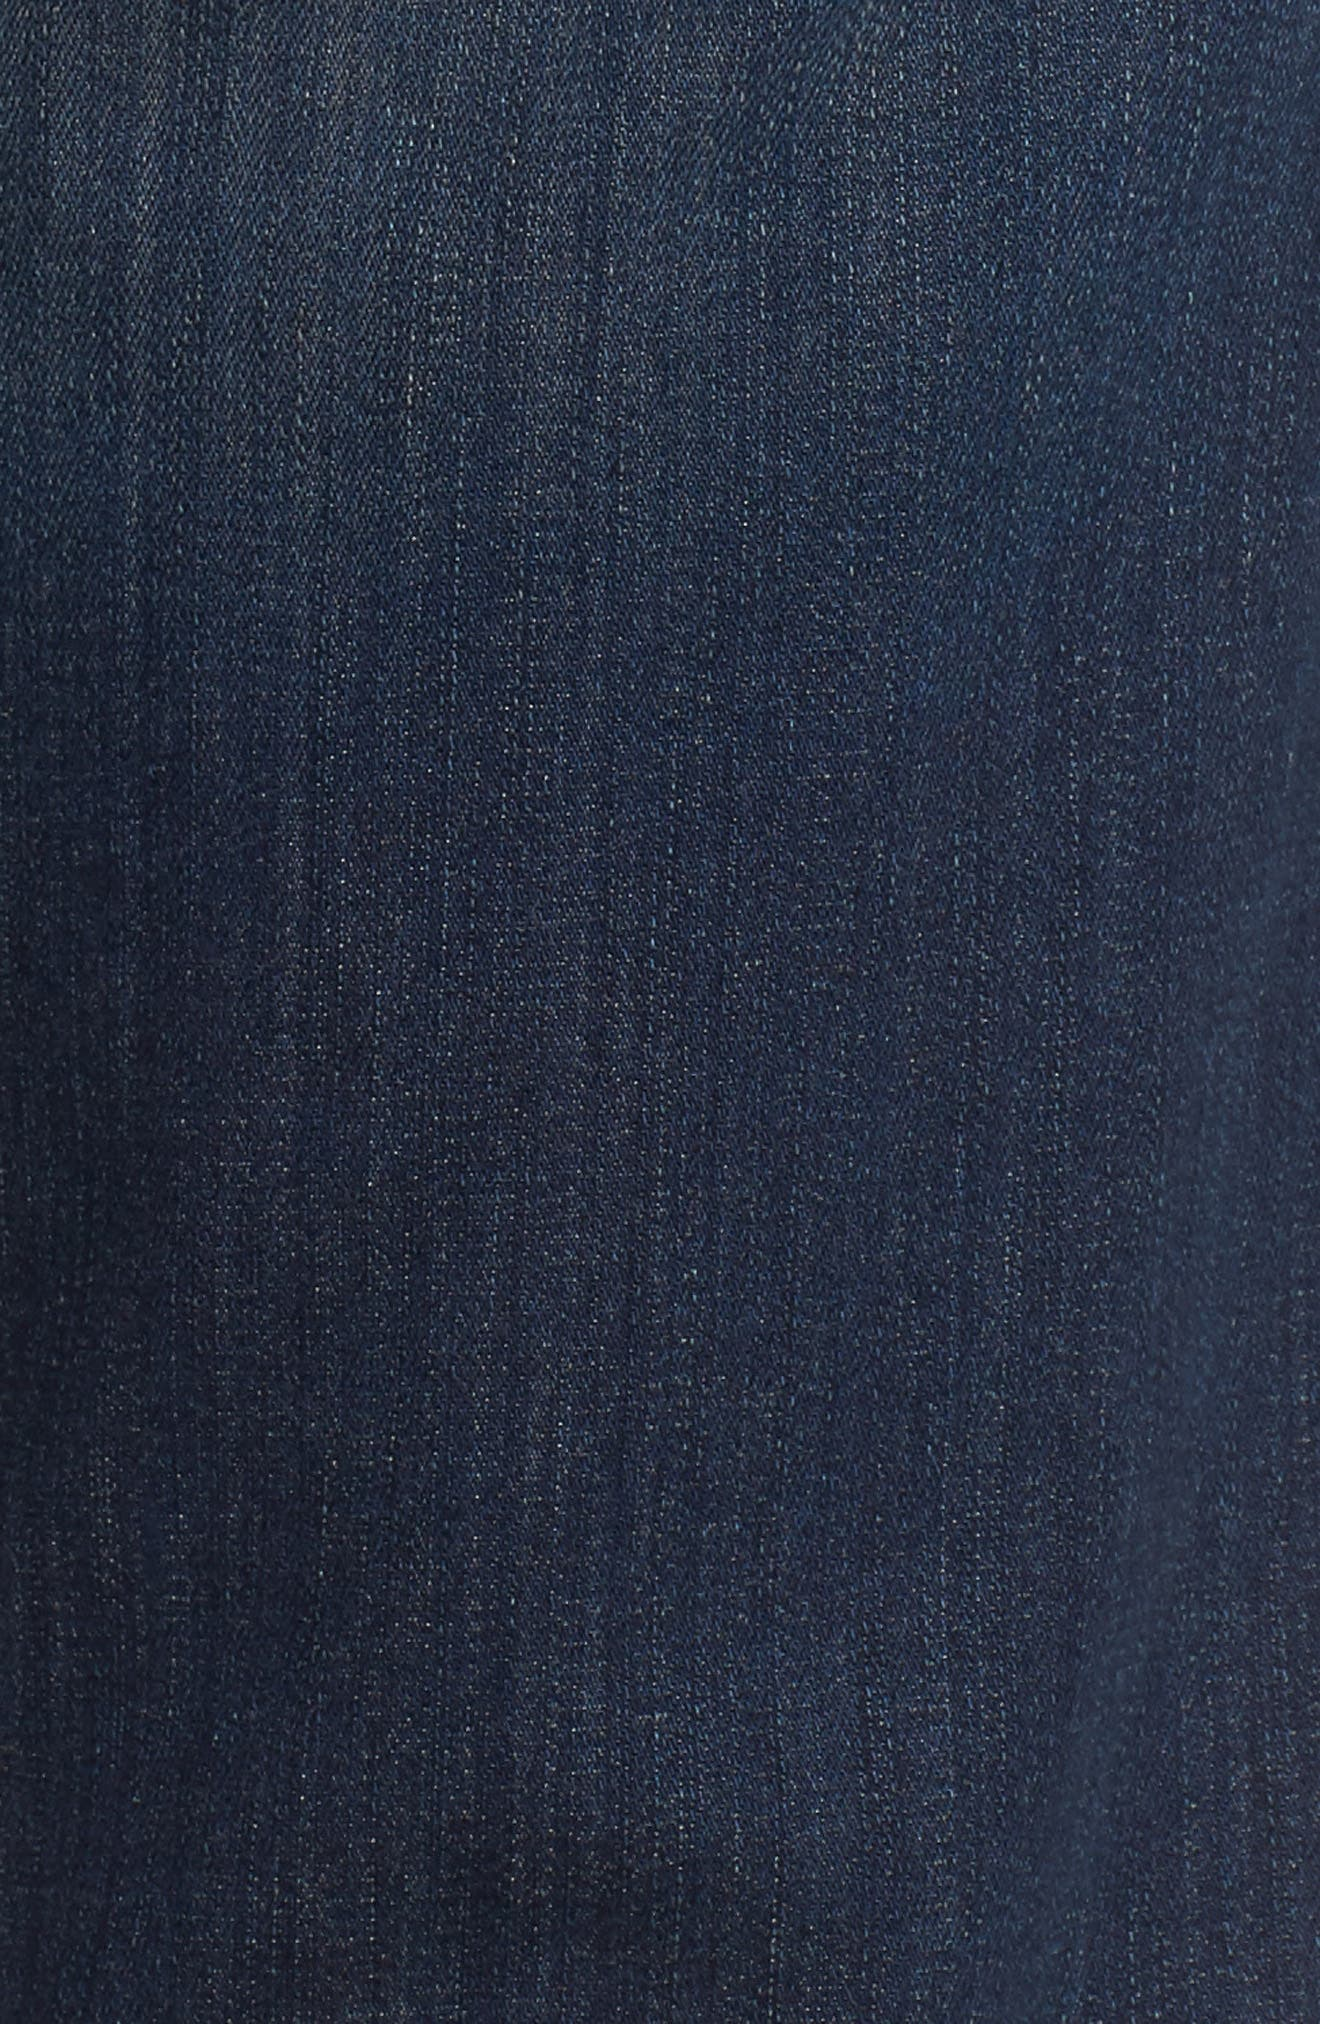 Transcend - Lennox Slim Fit Jeans,                             Alternate thumbnail 5, color,                             Freeman